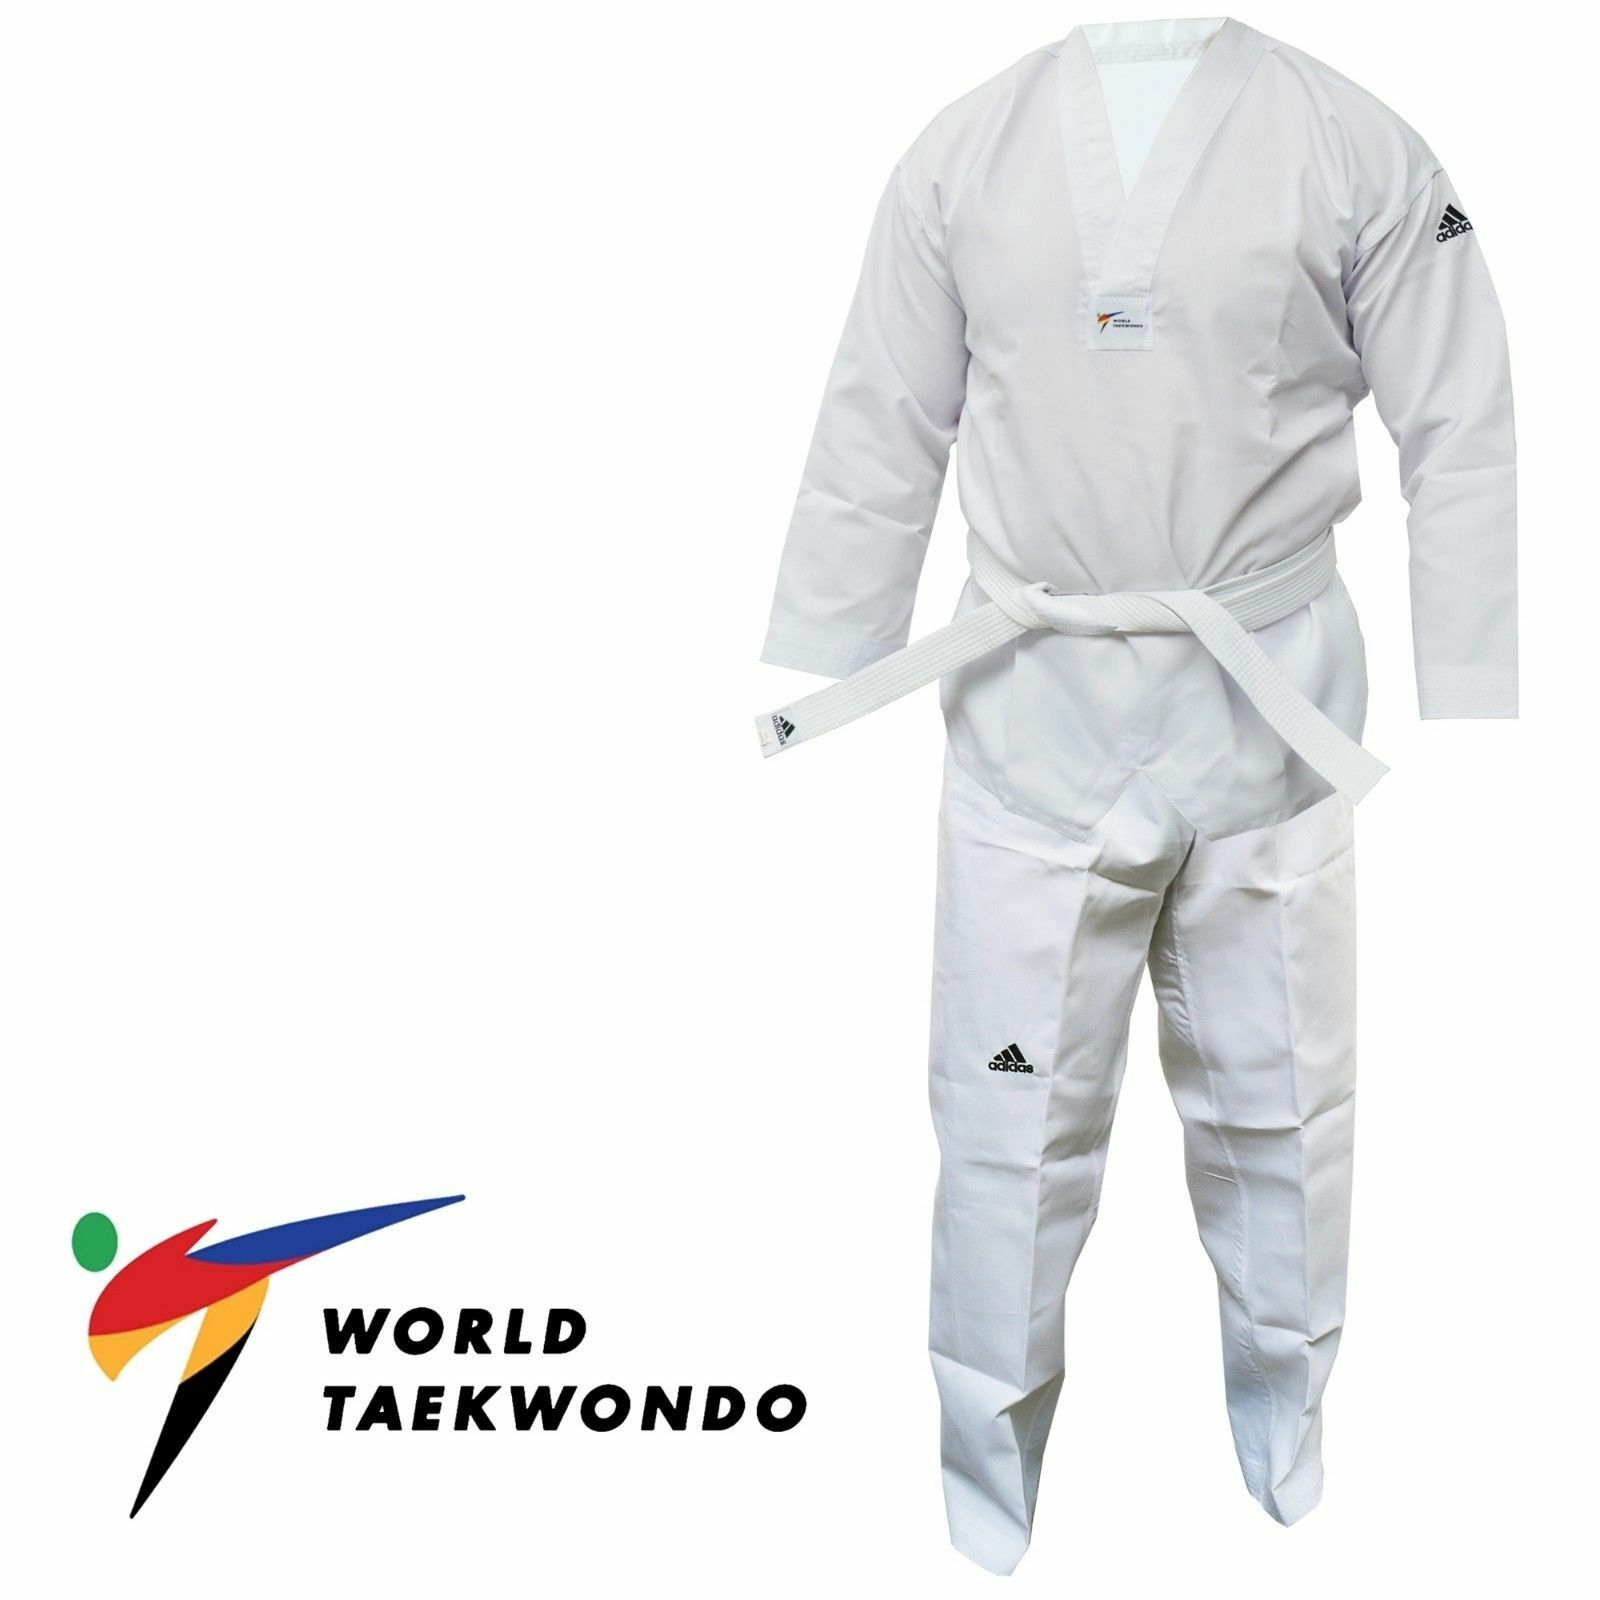 Adidas Taekwondo Suit WT Suit Adult Kids Dobok White Men Womens Boys WTF Uniform